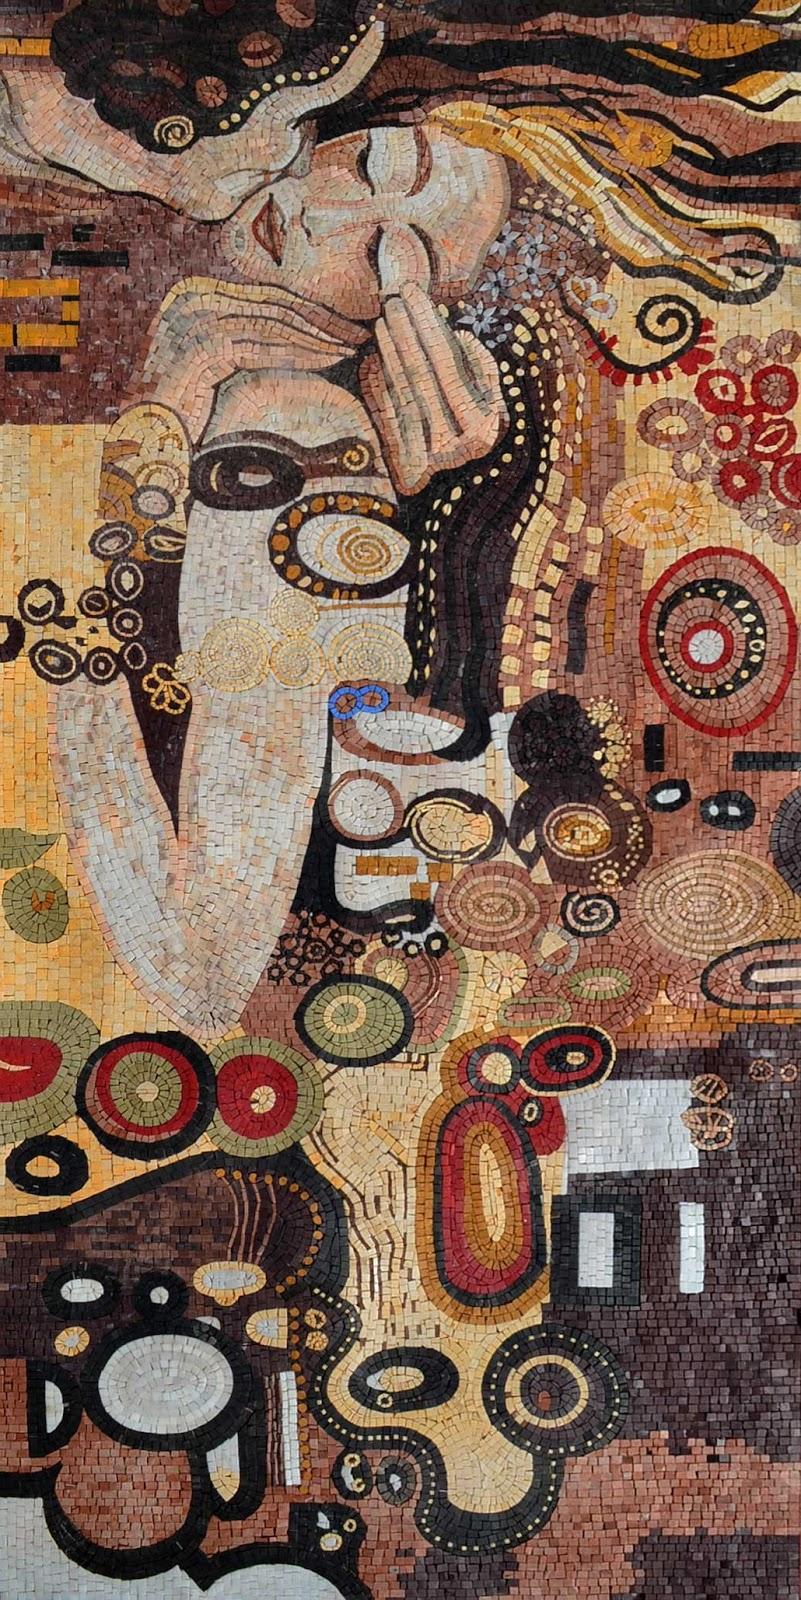 """The Kiss"" by Gustav Klimt Mosaic Reproduction"